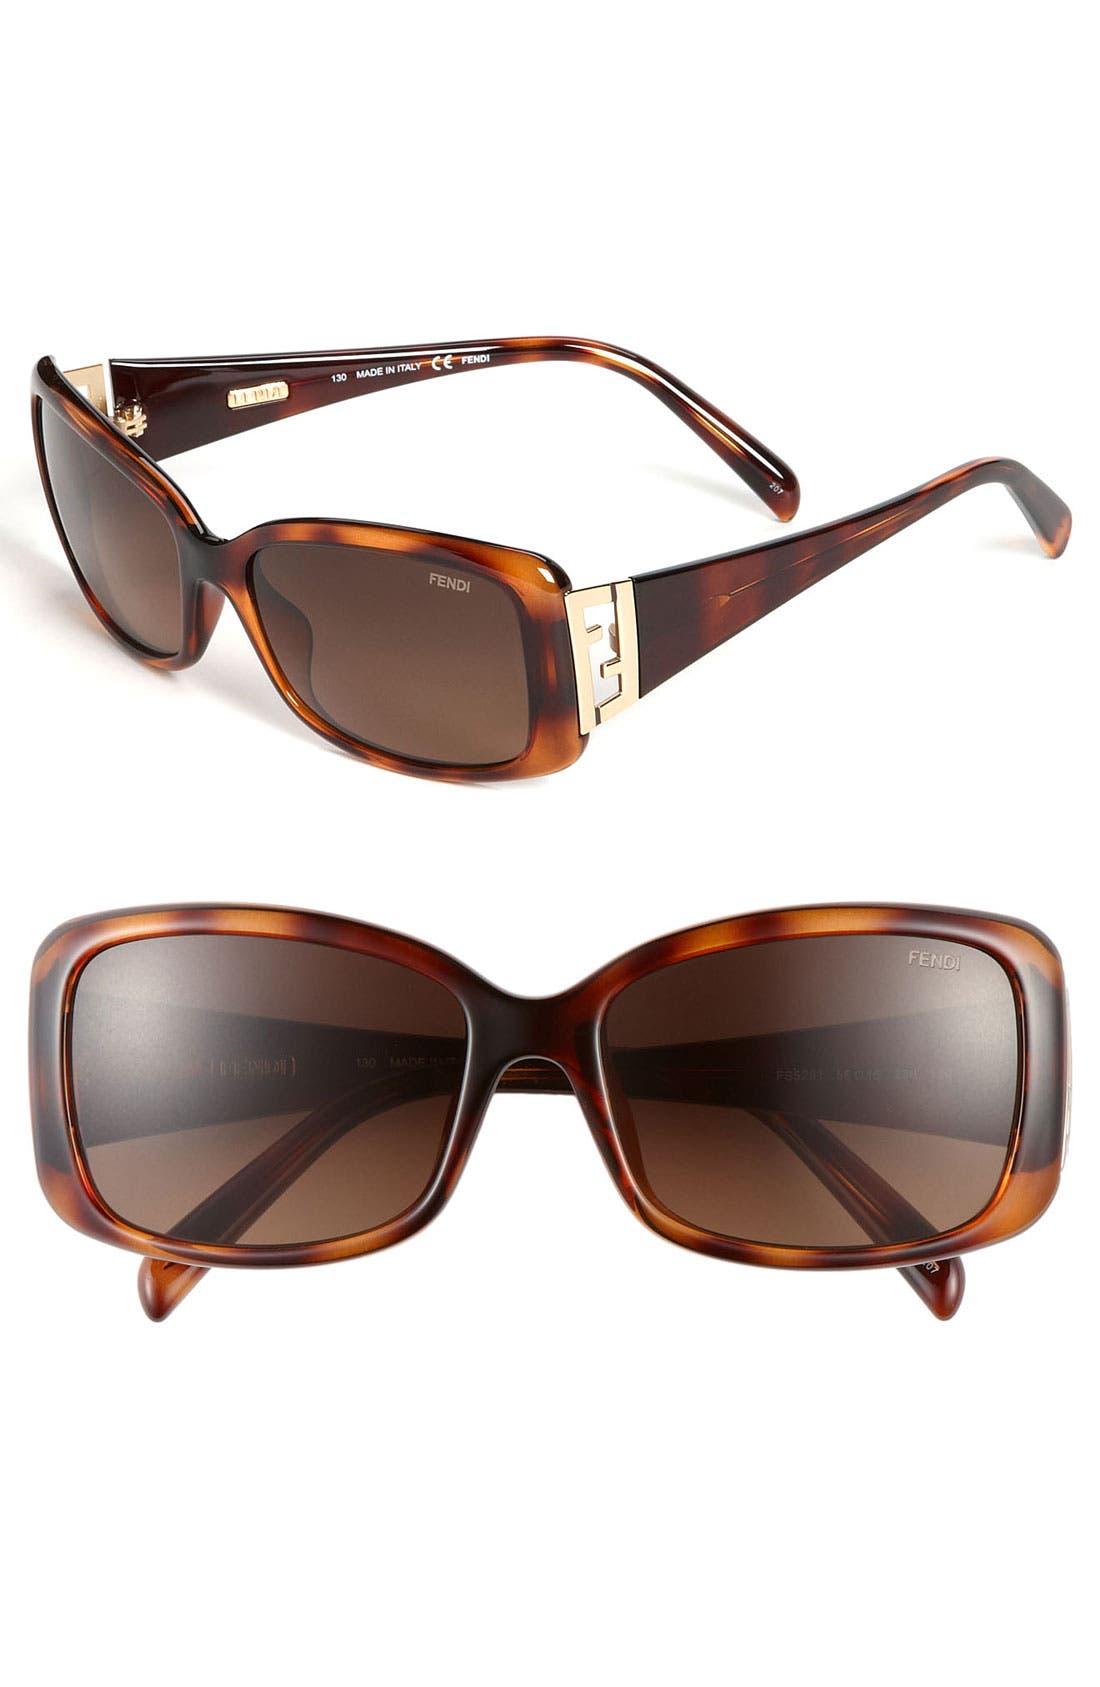 Main Image - Fendi 'Double F' 56mm Sunglasses